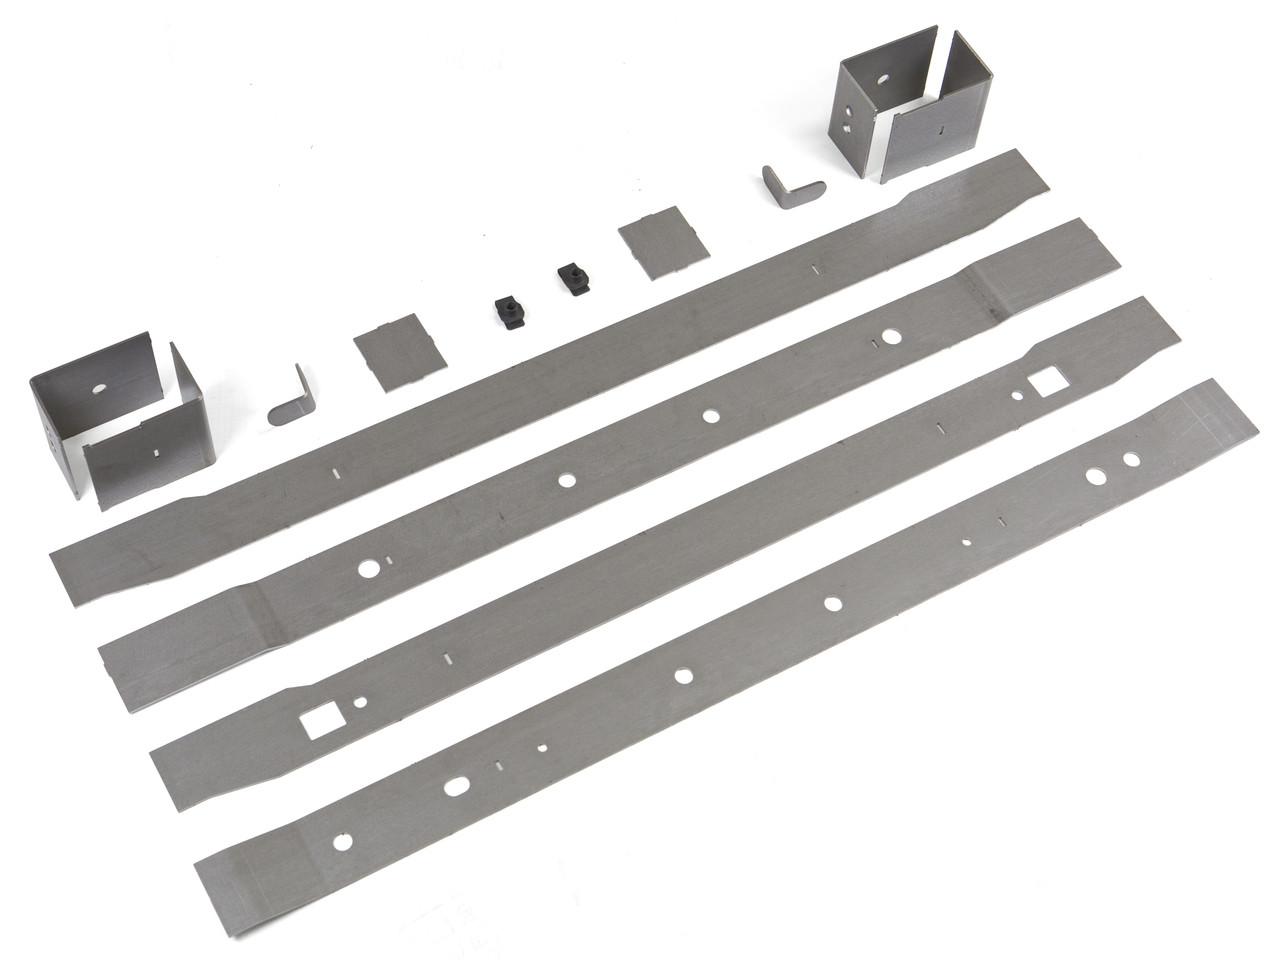 JK Rear Frame Repair Kit from GenRight